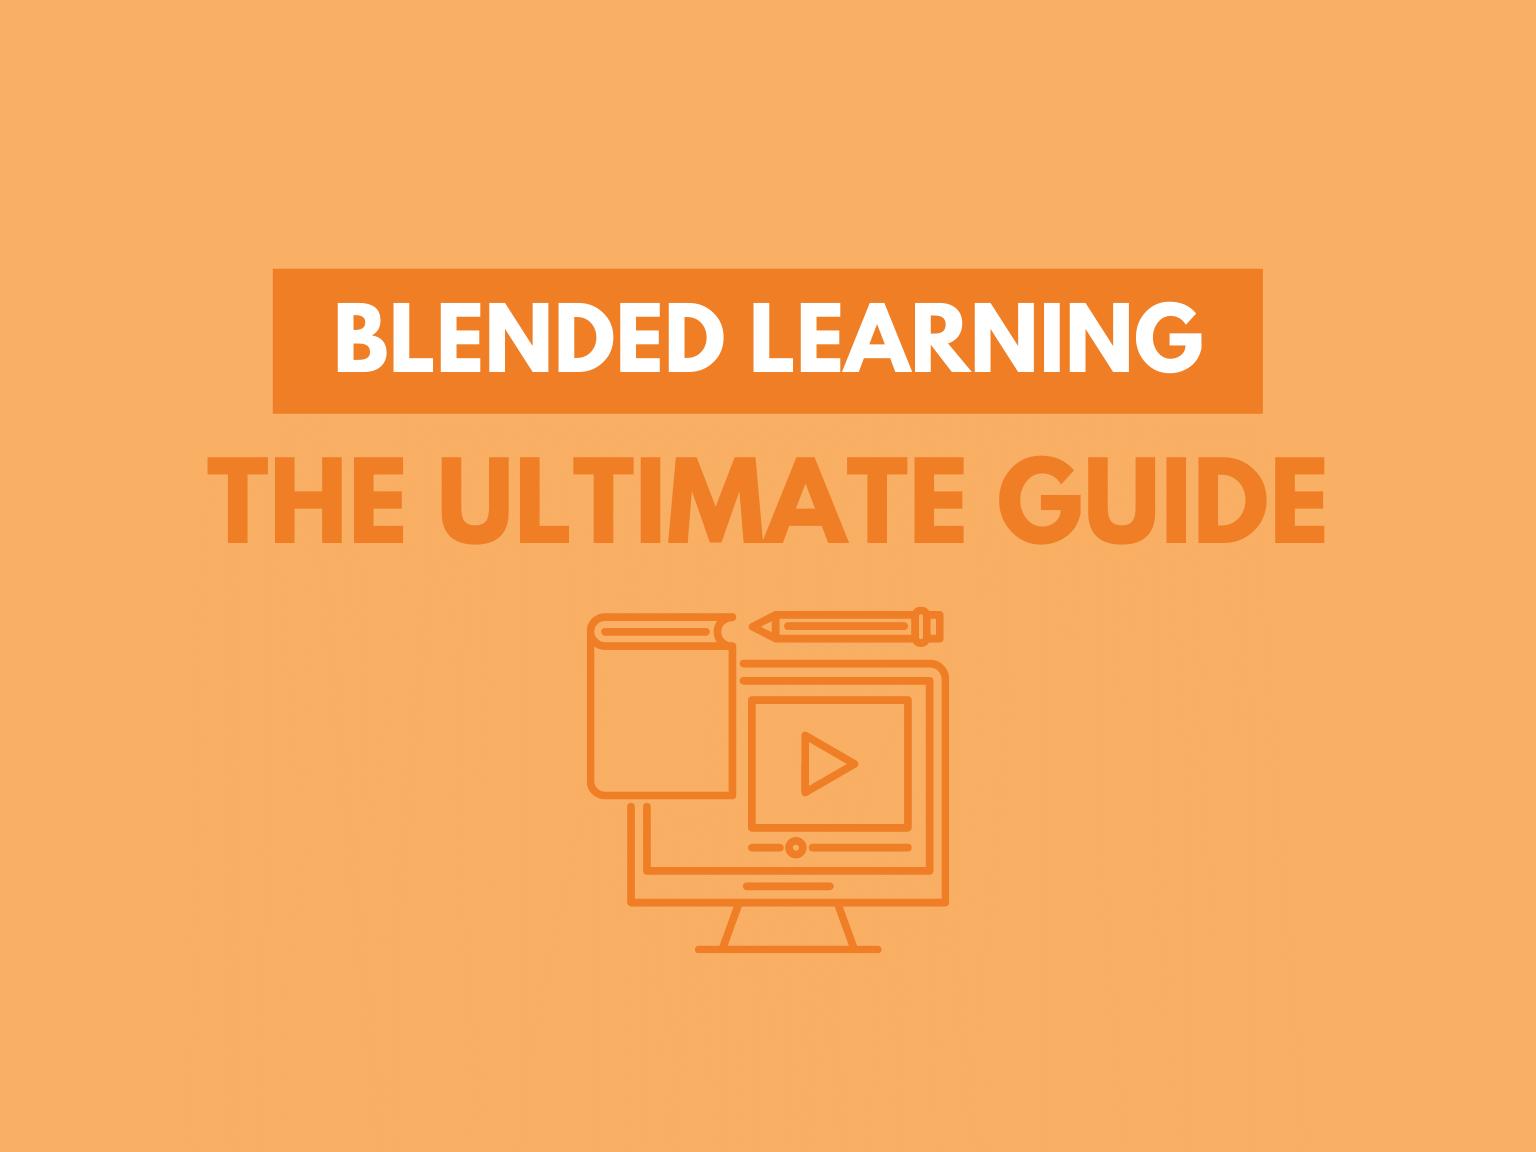 Blended Learning The Ultimate Guide 2020 Header